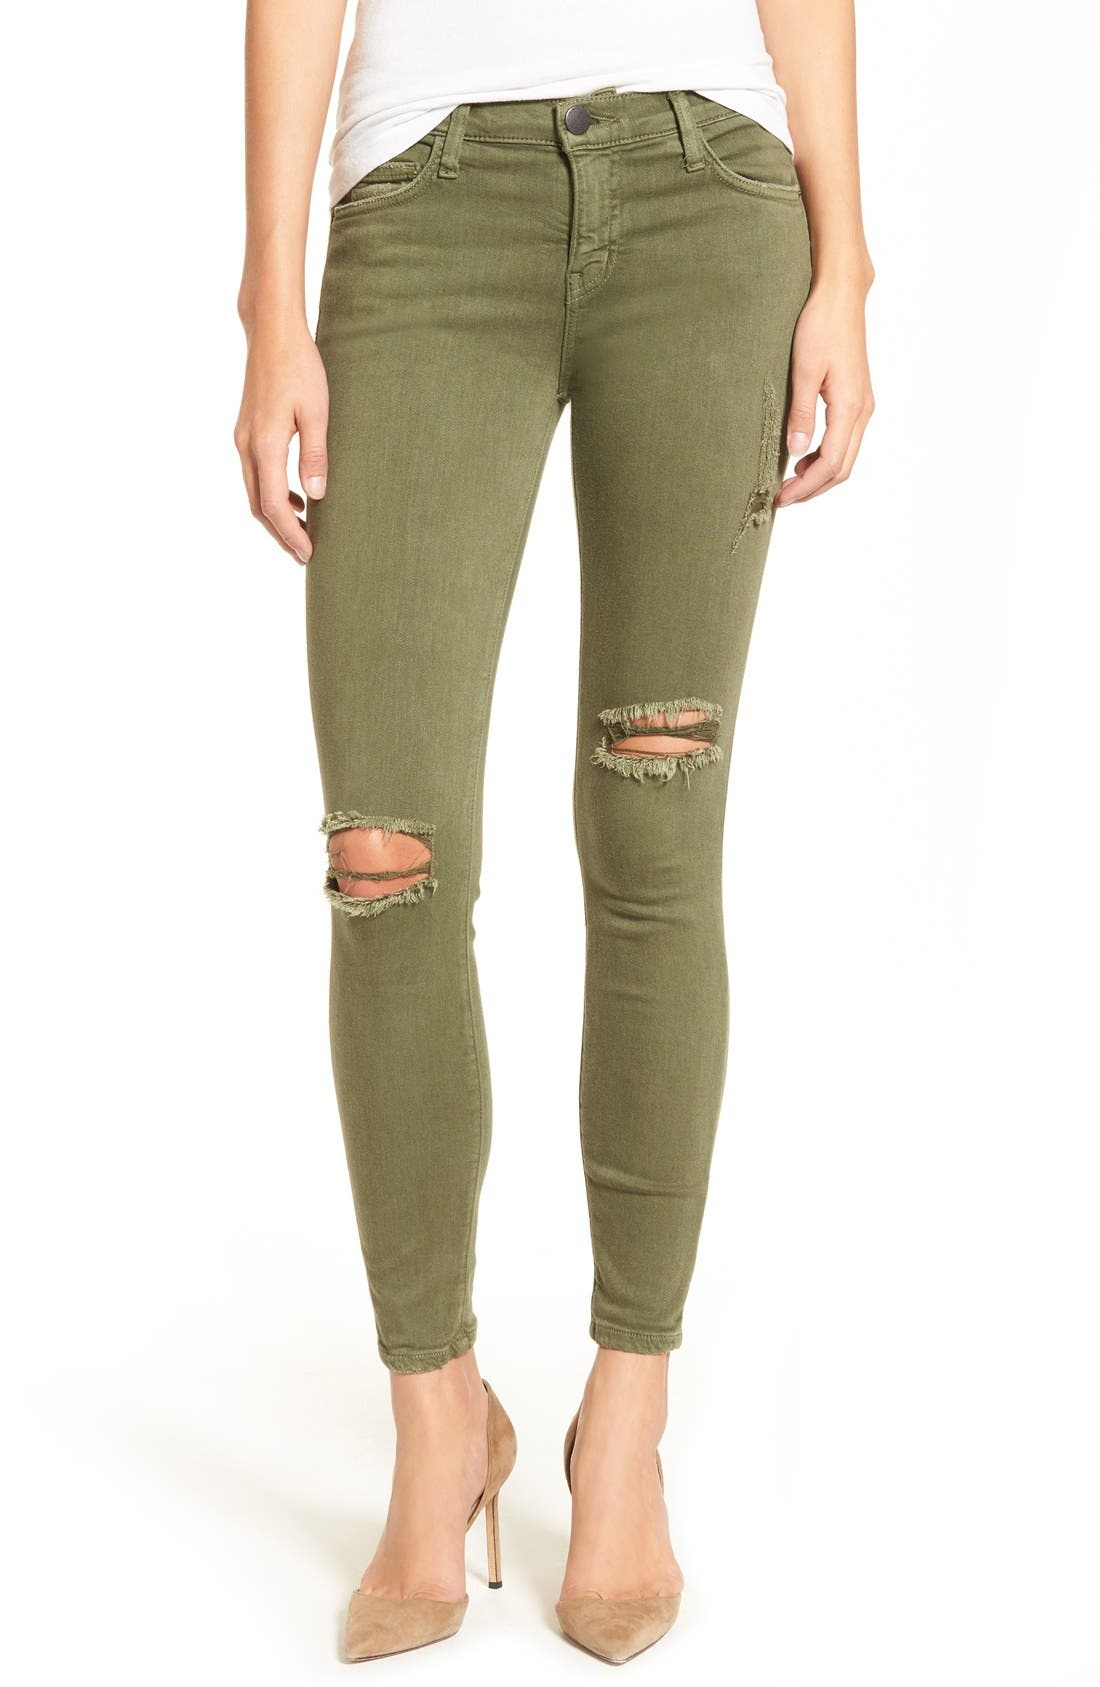 CURRENT/ELLIOTT, 'The Stiletto' Crop Skinny Jeans, Main thumbnail 1, color, 309